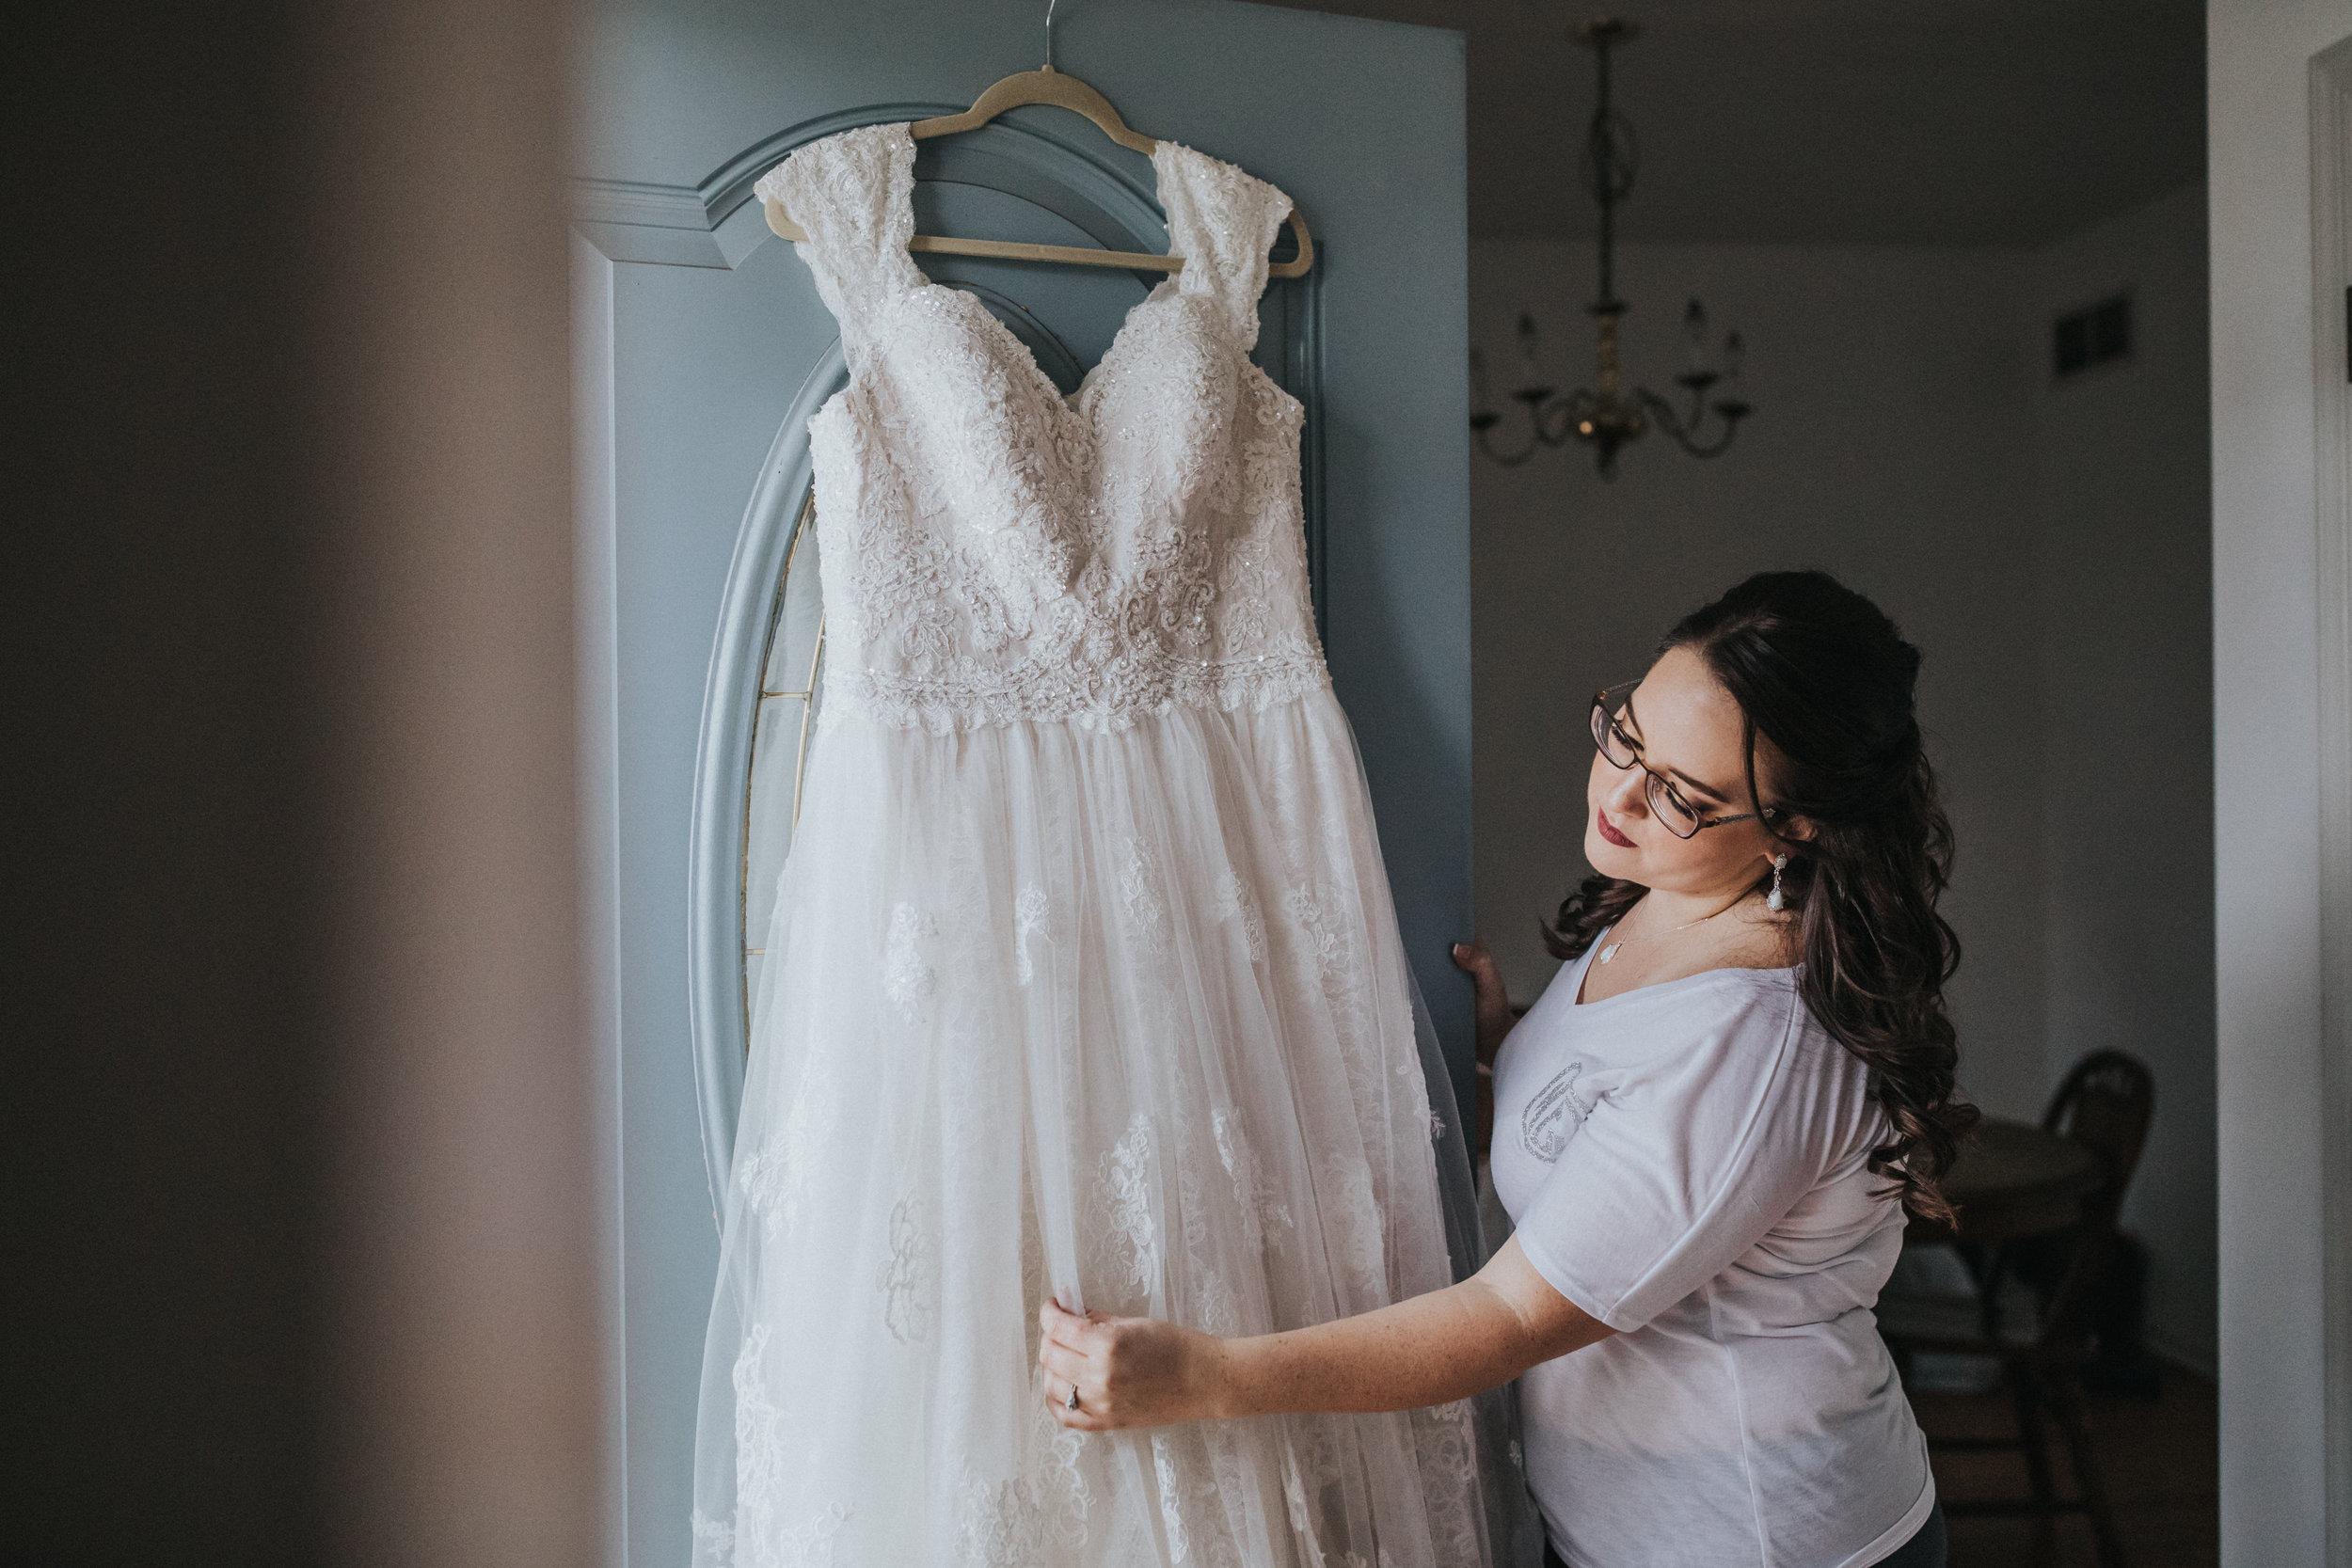 New-Jersey-Wedding-Photography-Fishers-Tudor-House-JennaLynnPhotography-Getting-Ready-Kathleen&Eddie-35.jpg